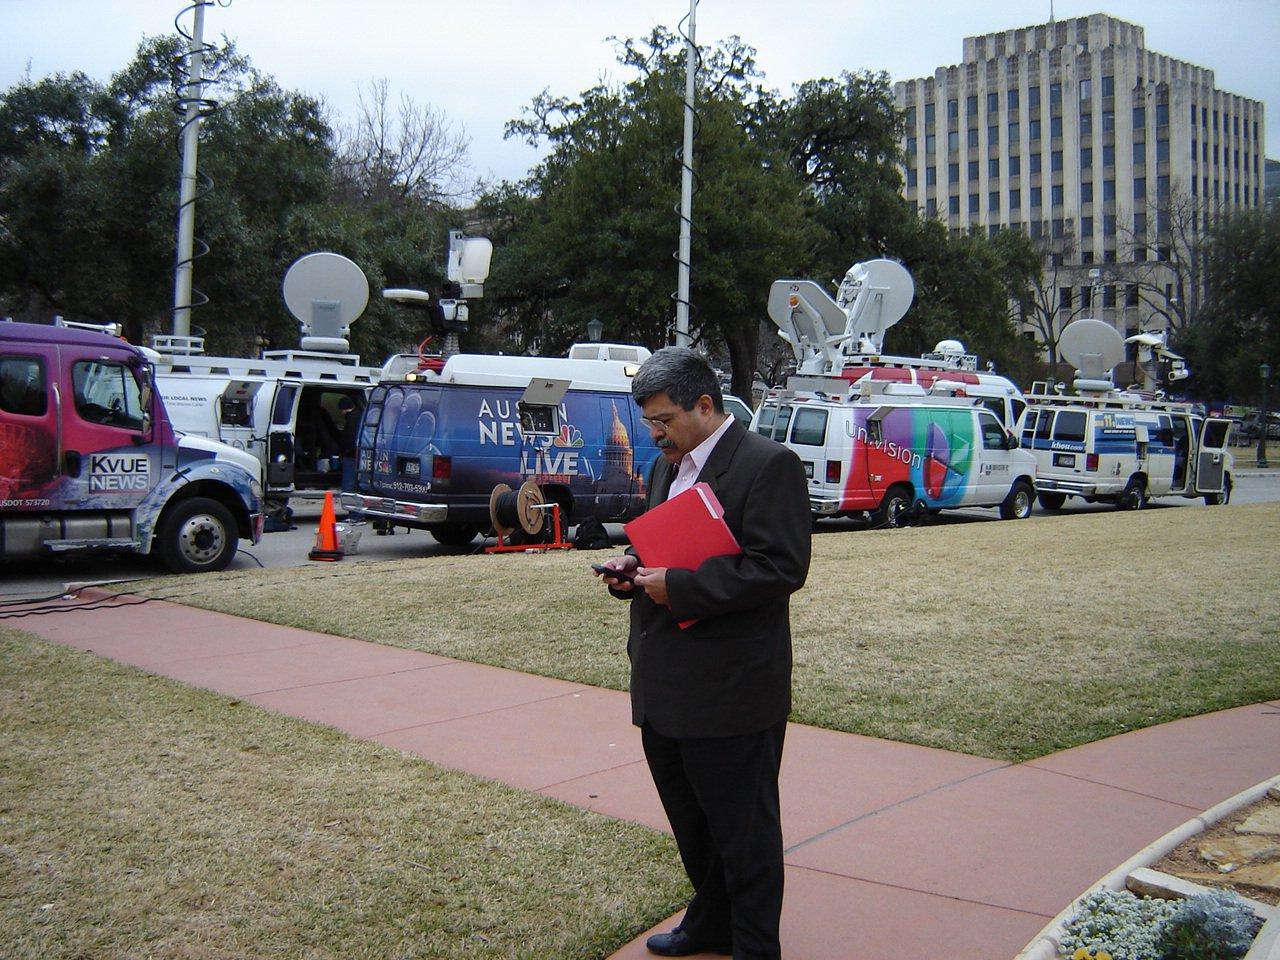 Arthur Cavazos working press row in Austin, TX